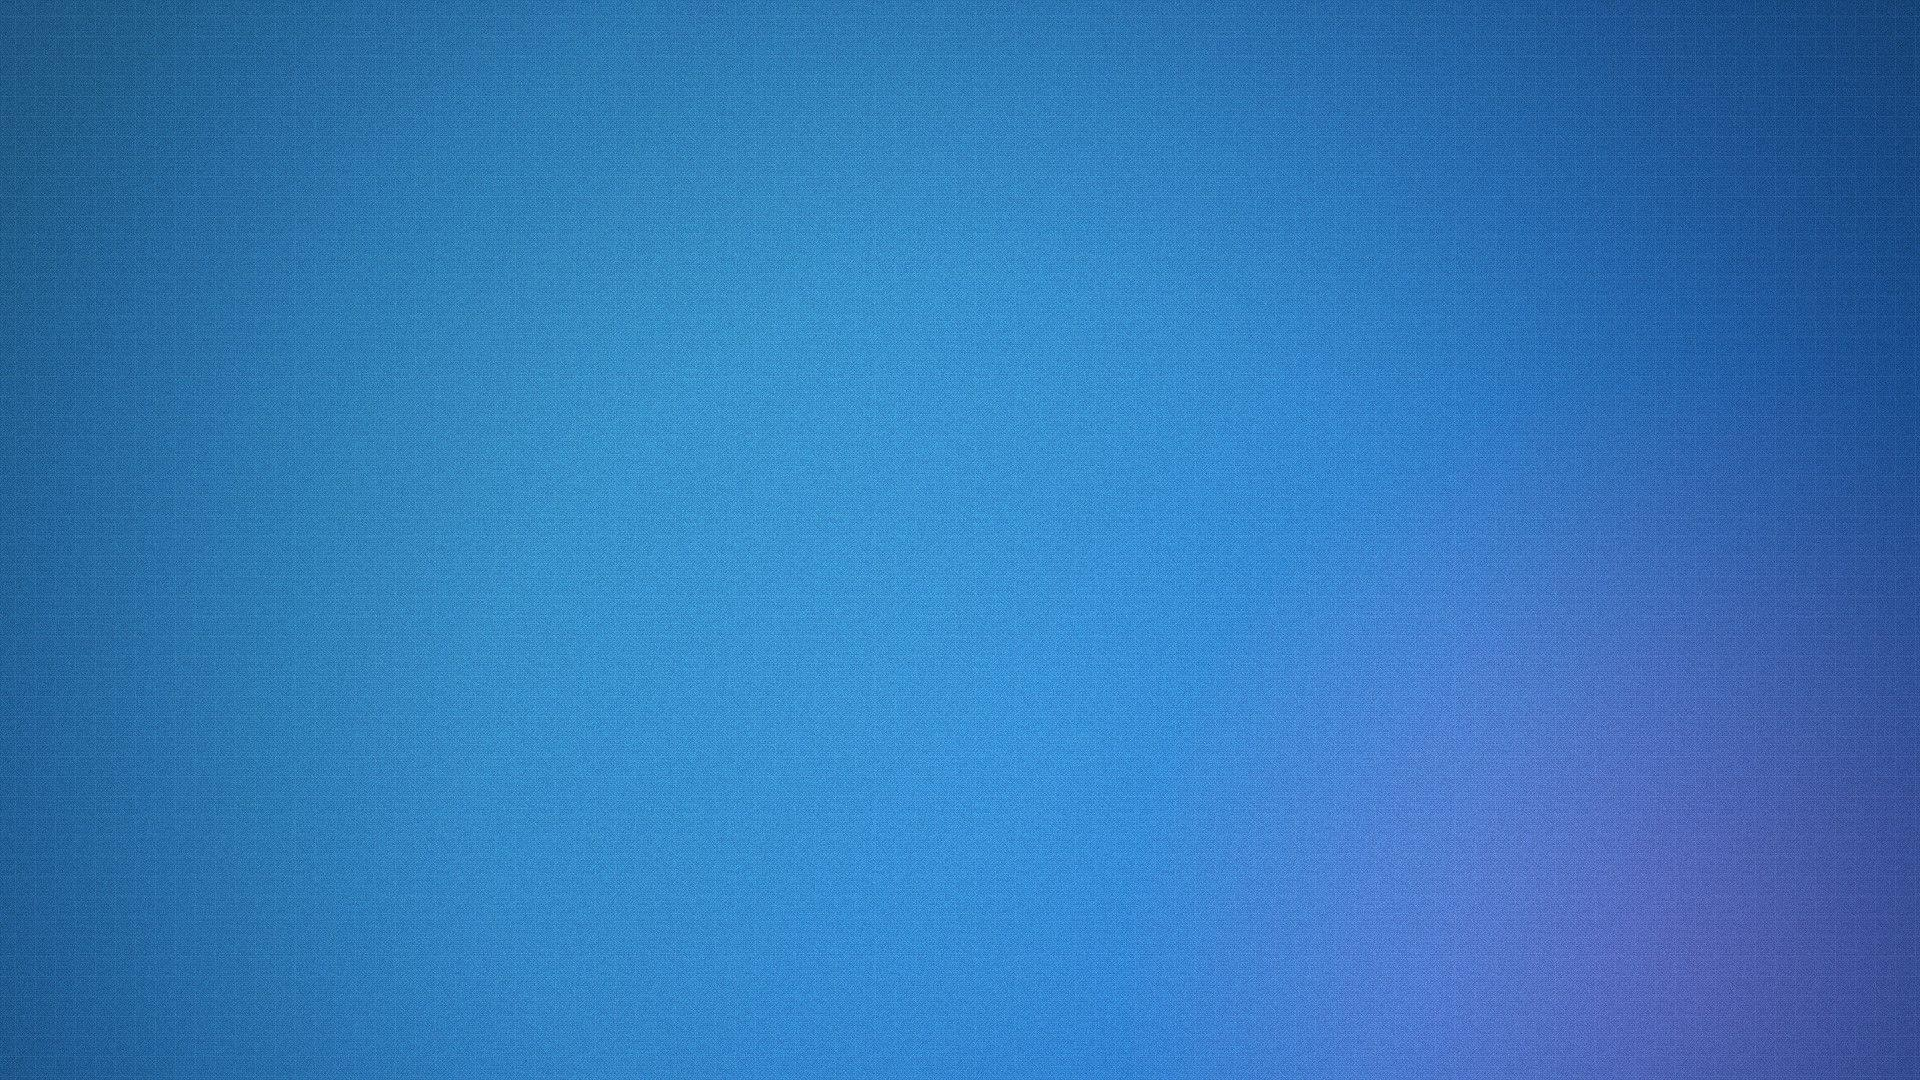 Light Blue Backgrounds 1920x1080